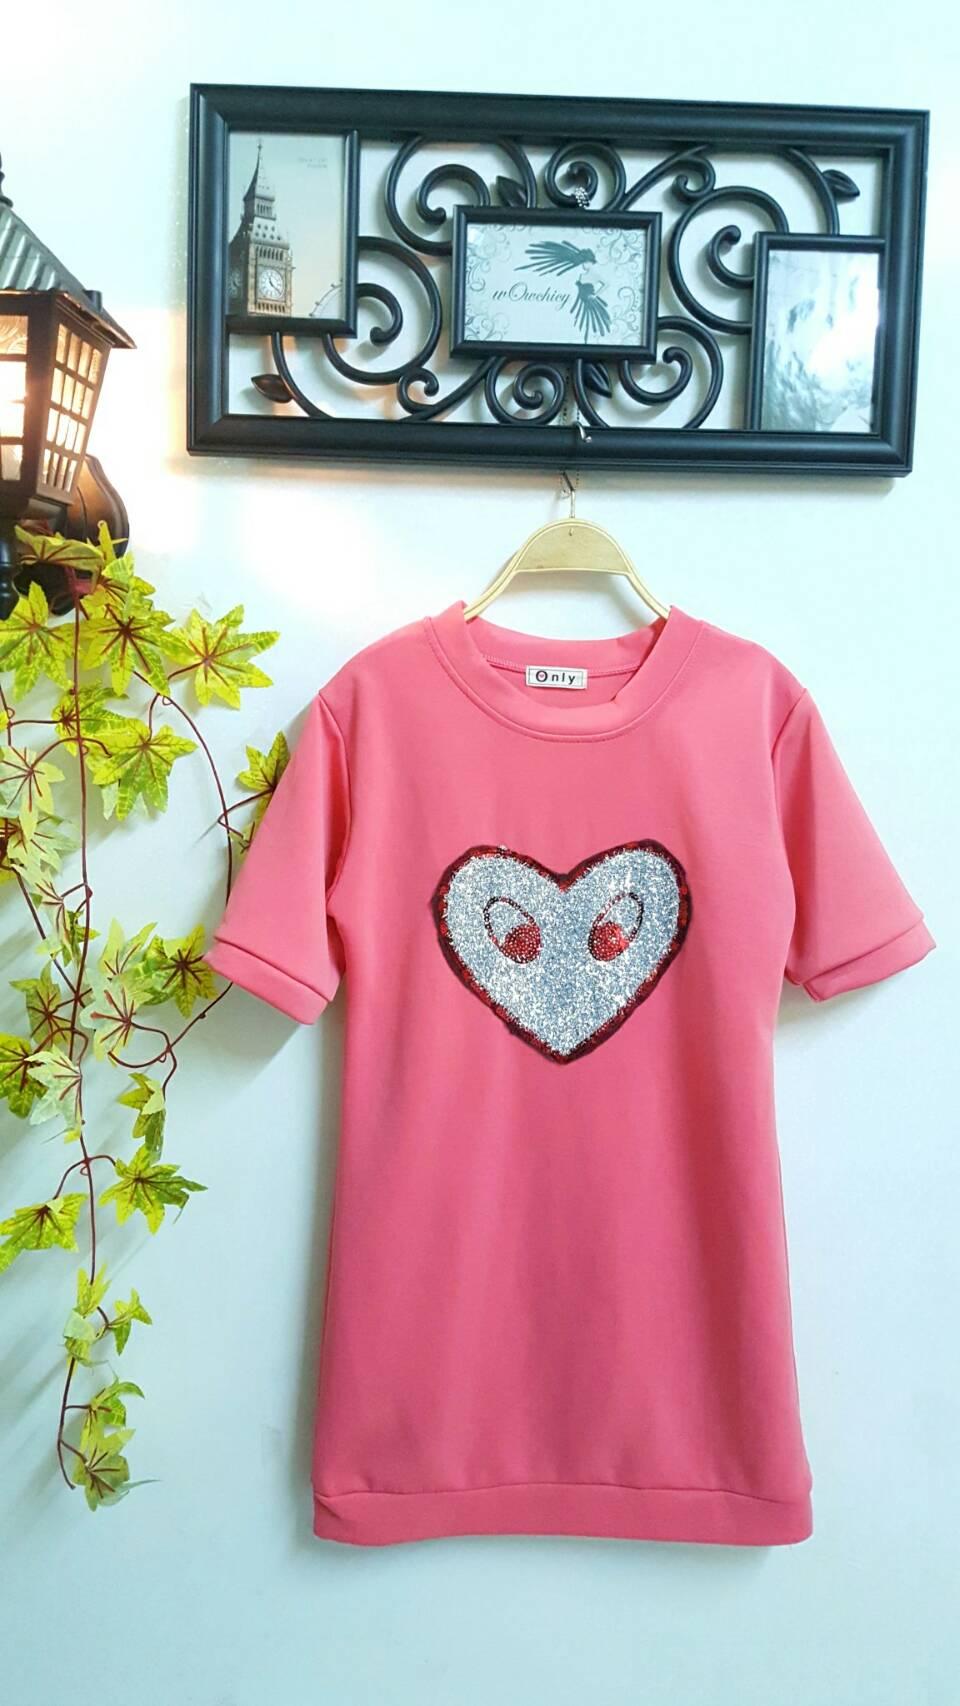 WOW Mini Dress : ชุดเดรสแขนสั้น ปักรูปหัวใจวิ้งๆ เก๋มาก ผลิตจากผ้าสคูบ้า เนื้อหนานุ่มค่ะ